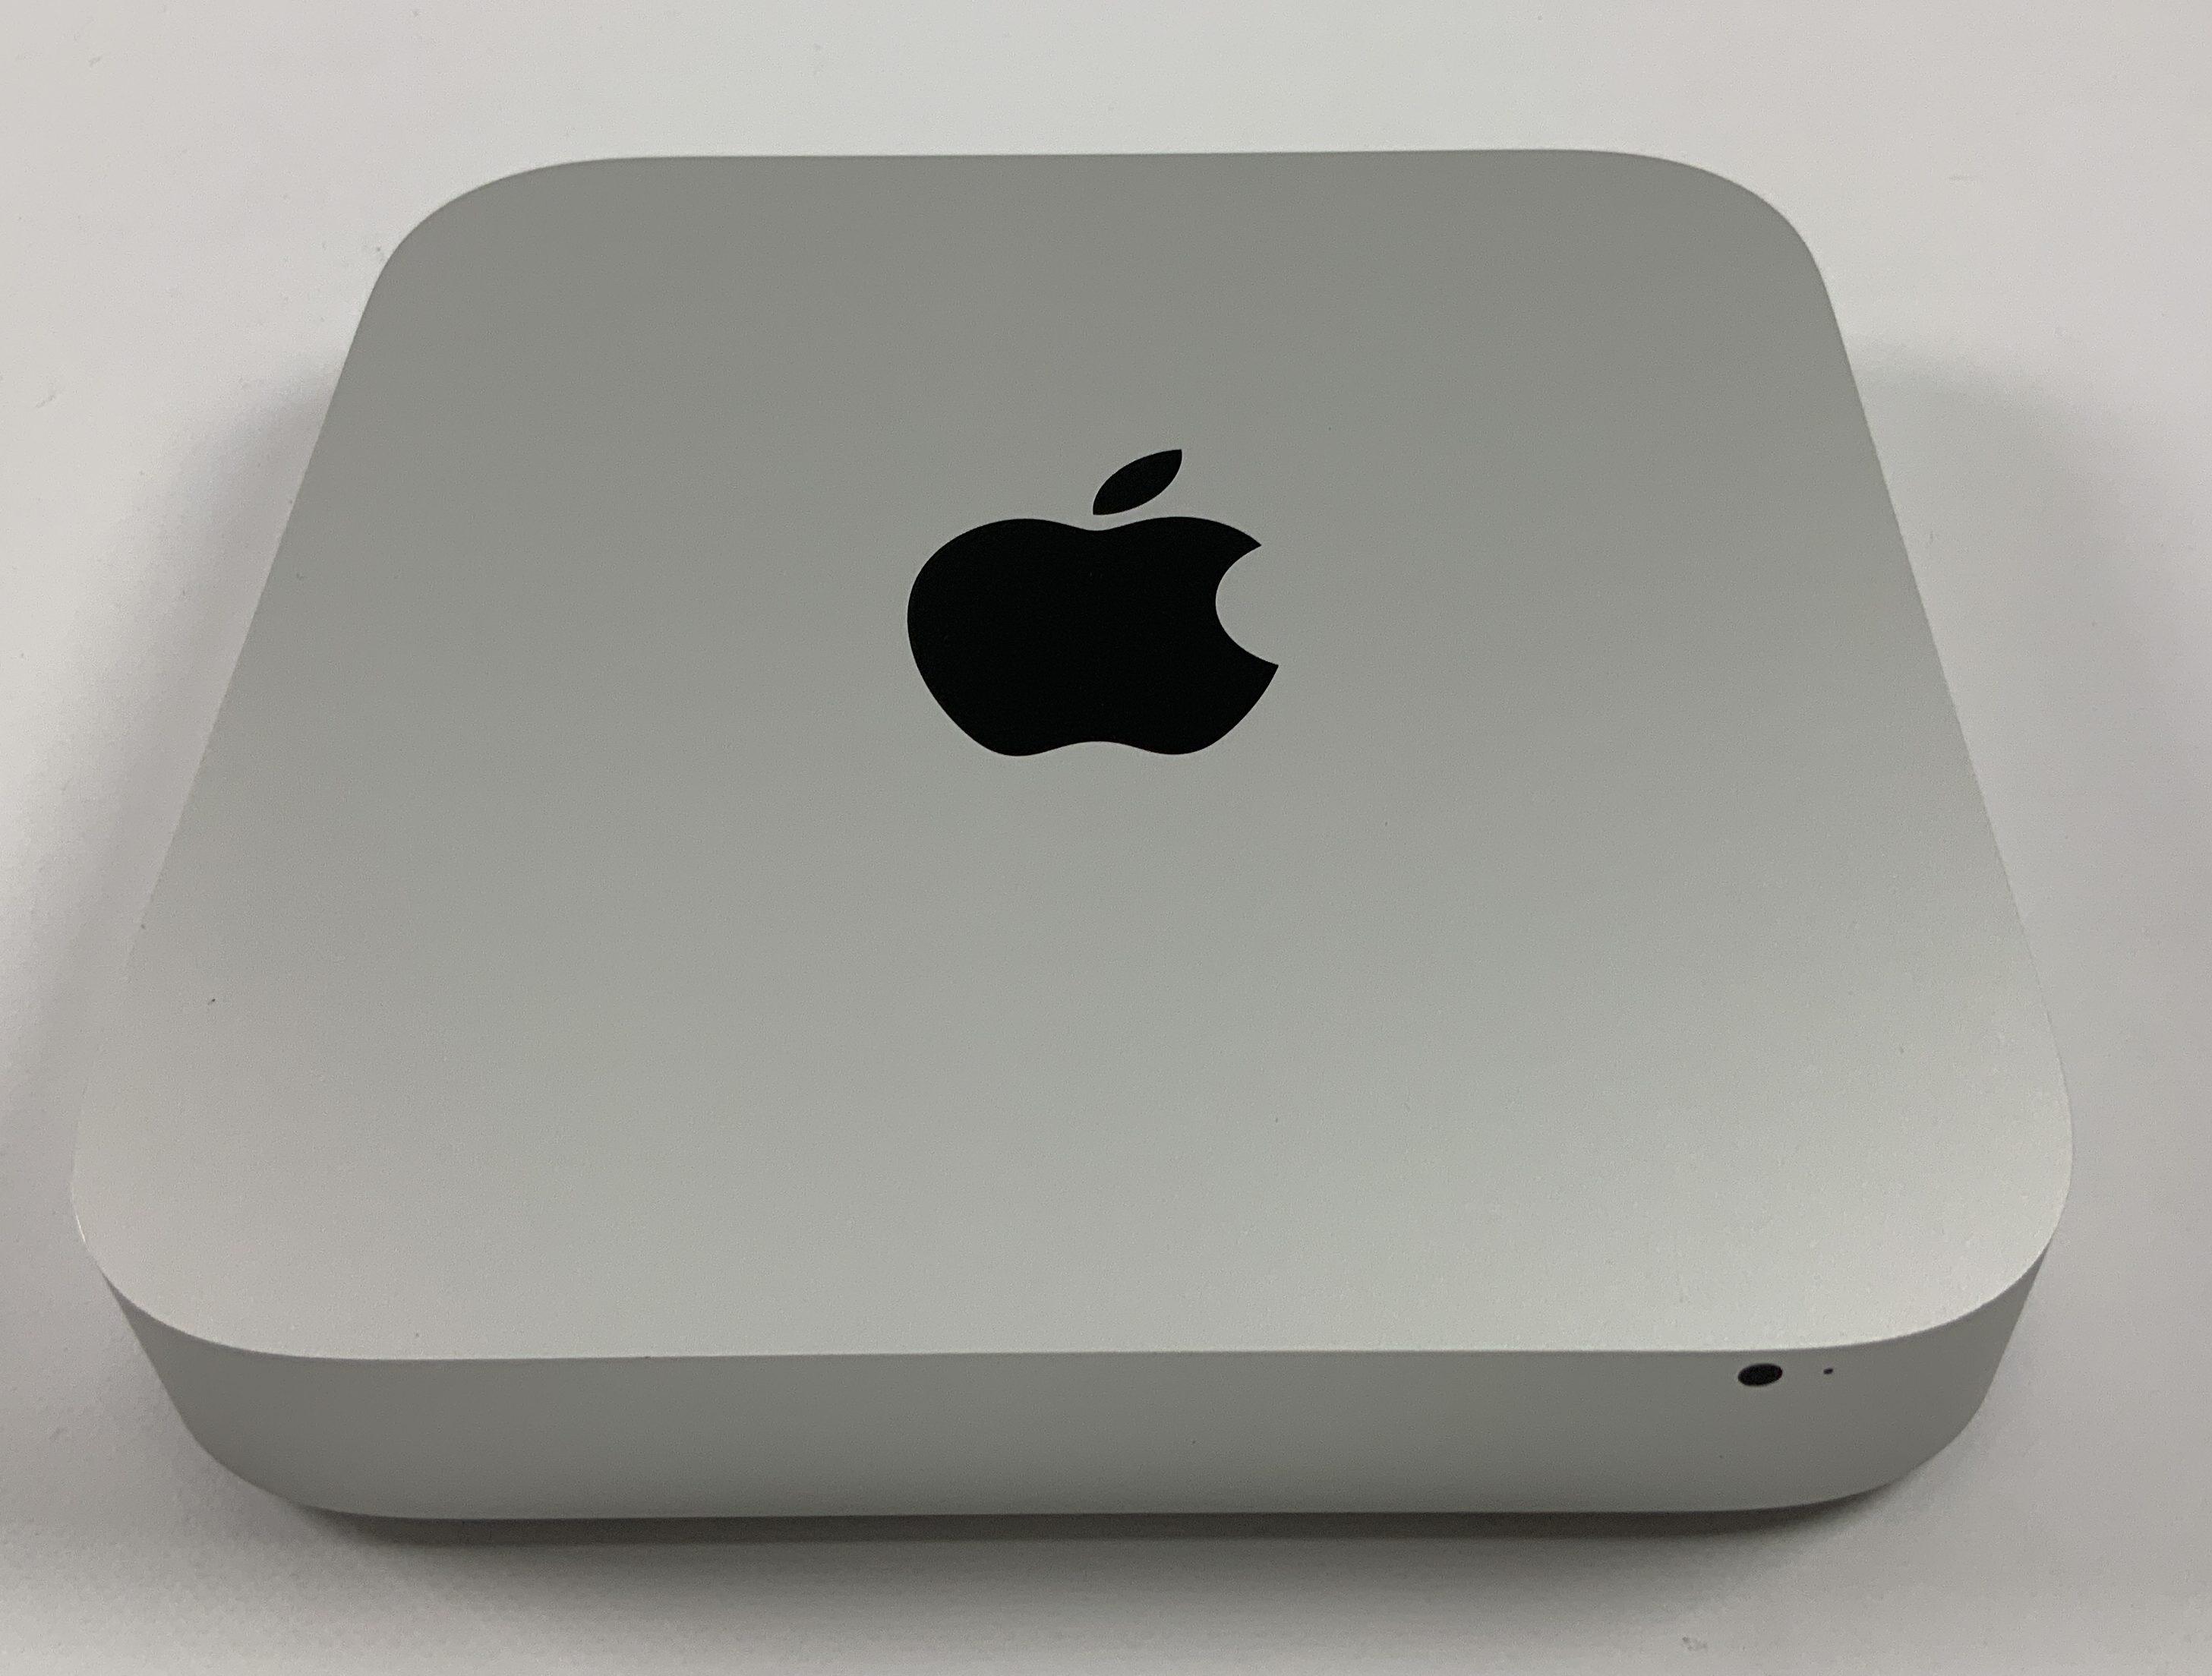 Mac Mini Late 2014 (Intel Core i5 2.8 GHz 8 GB RAM 1 TB Fusion Drive), Intel Core i5 2.8 GHz, 8 GB RAM, 1 TB Fusion Drive, immagine 1